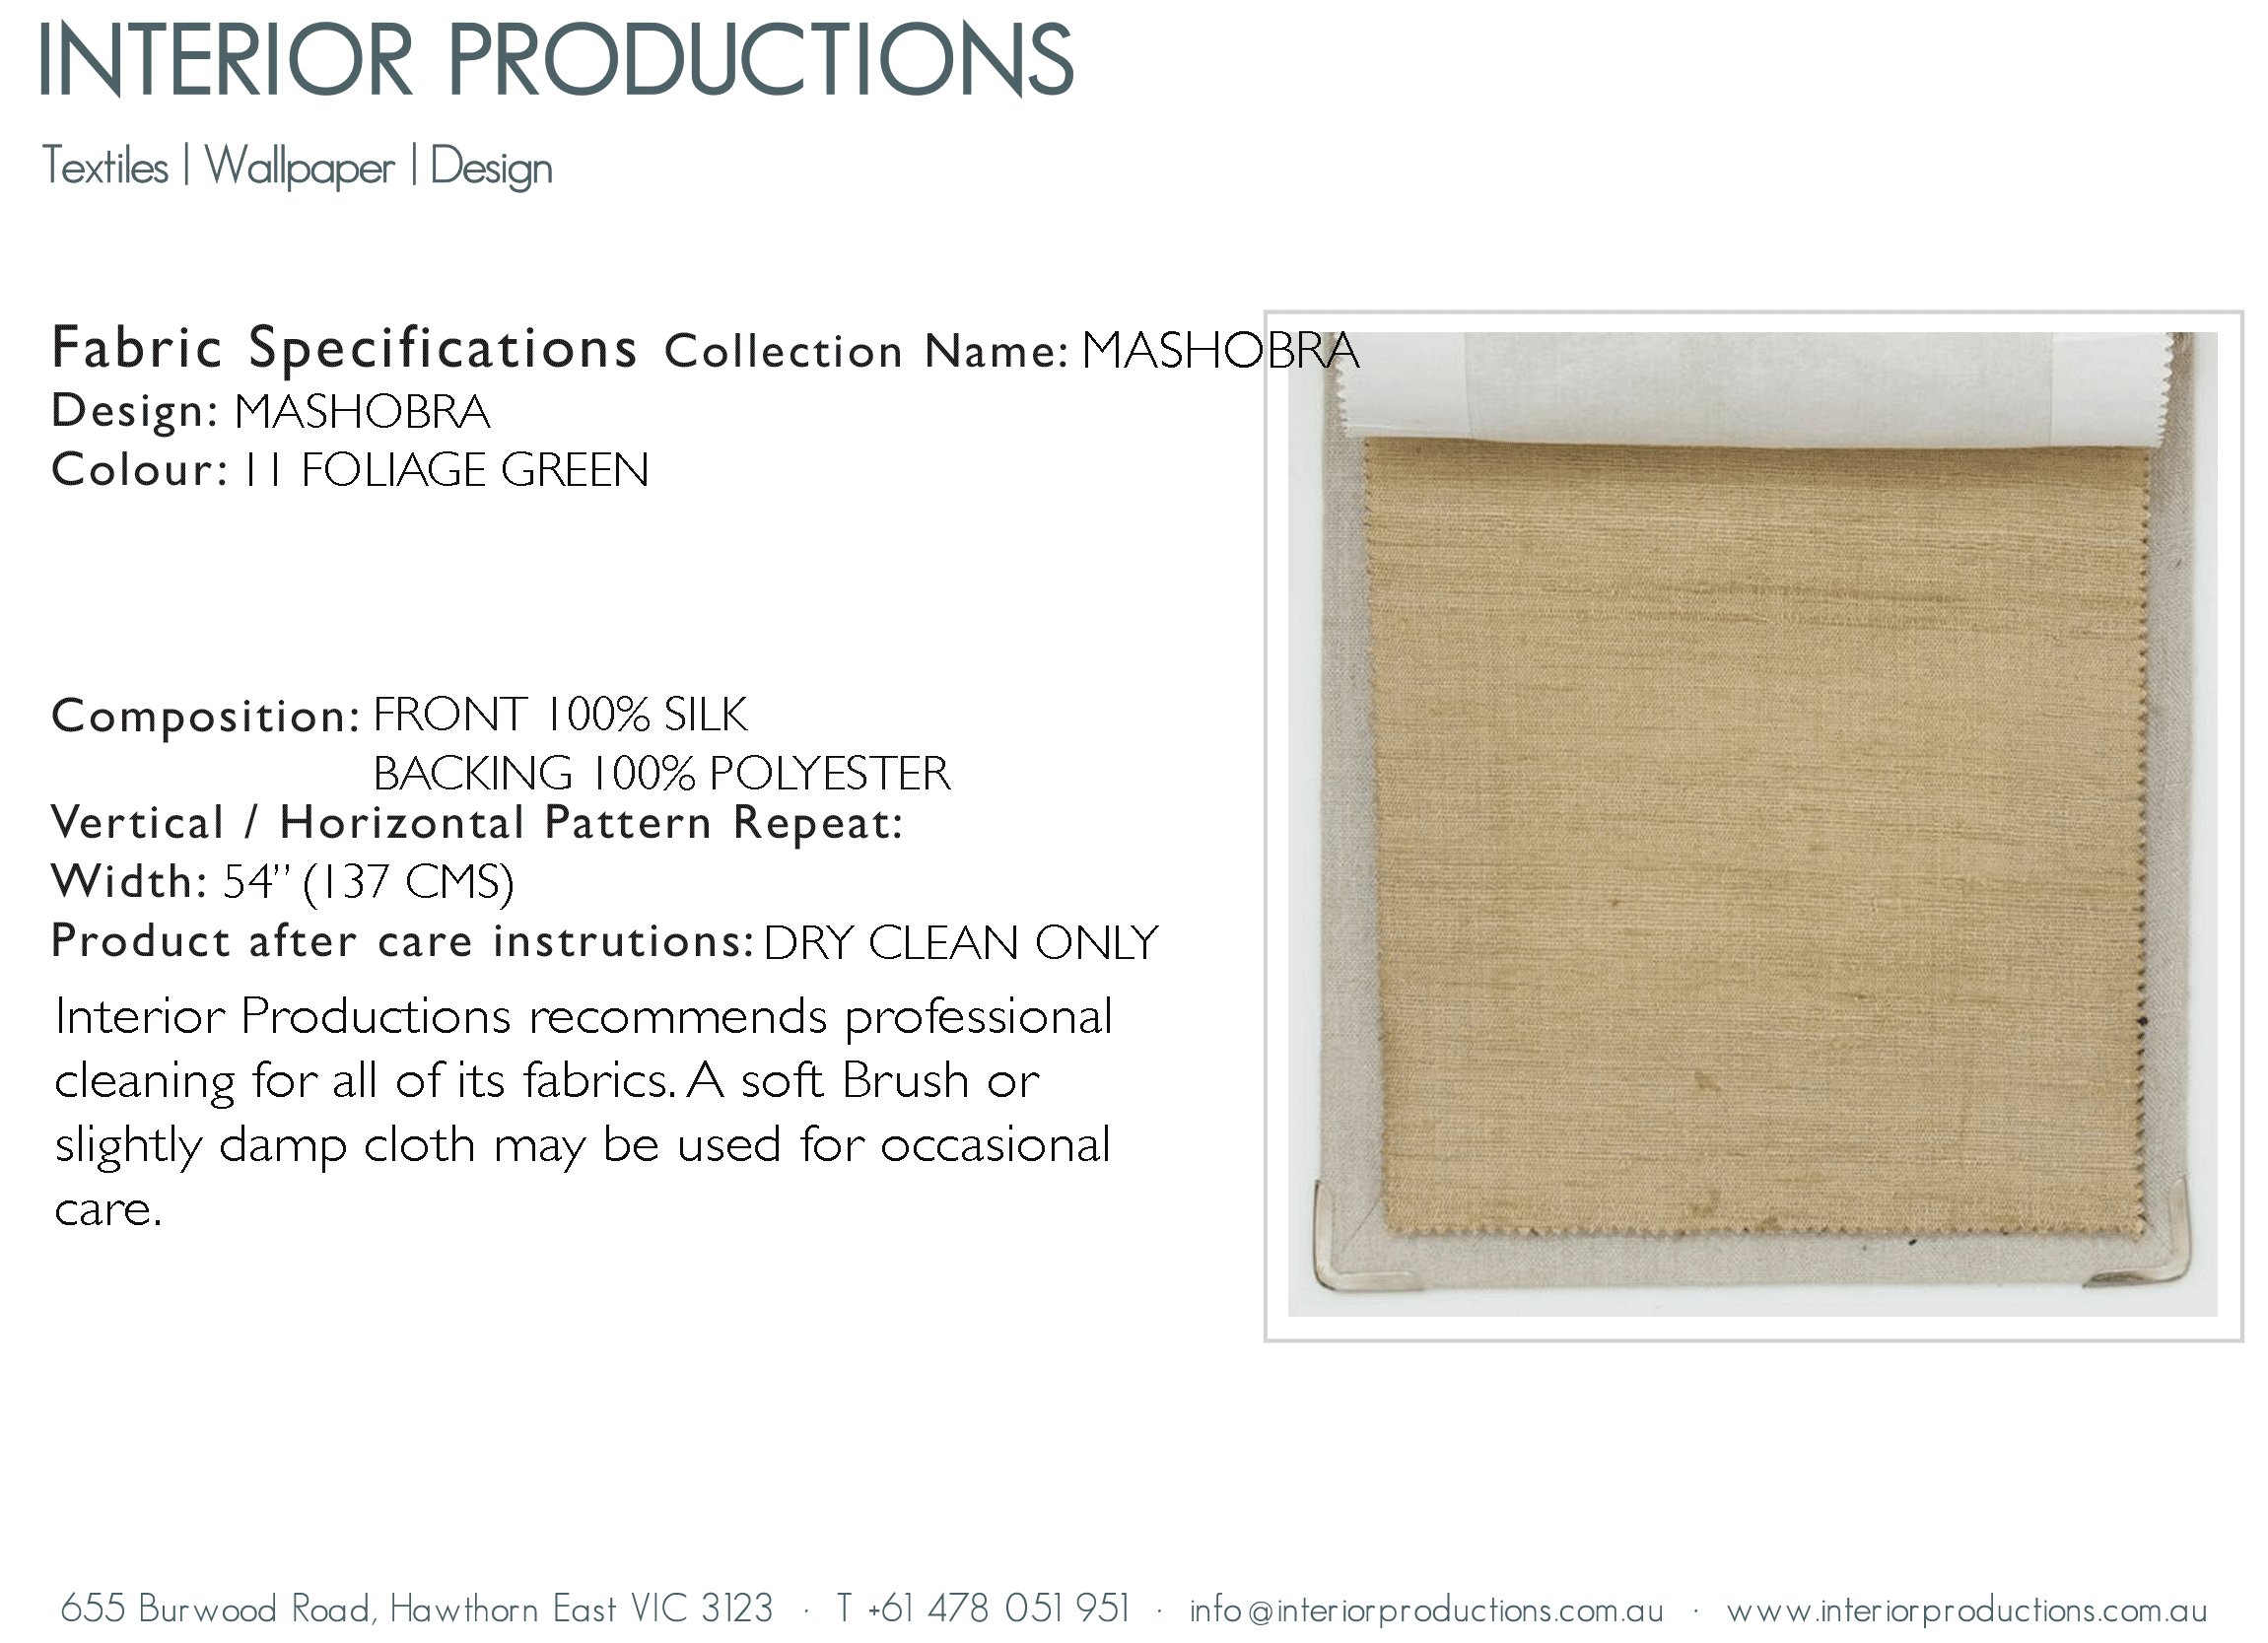 interior_productions_MASHOBRA---11-FOLIAGE-GREEN